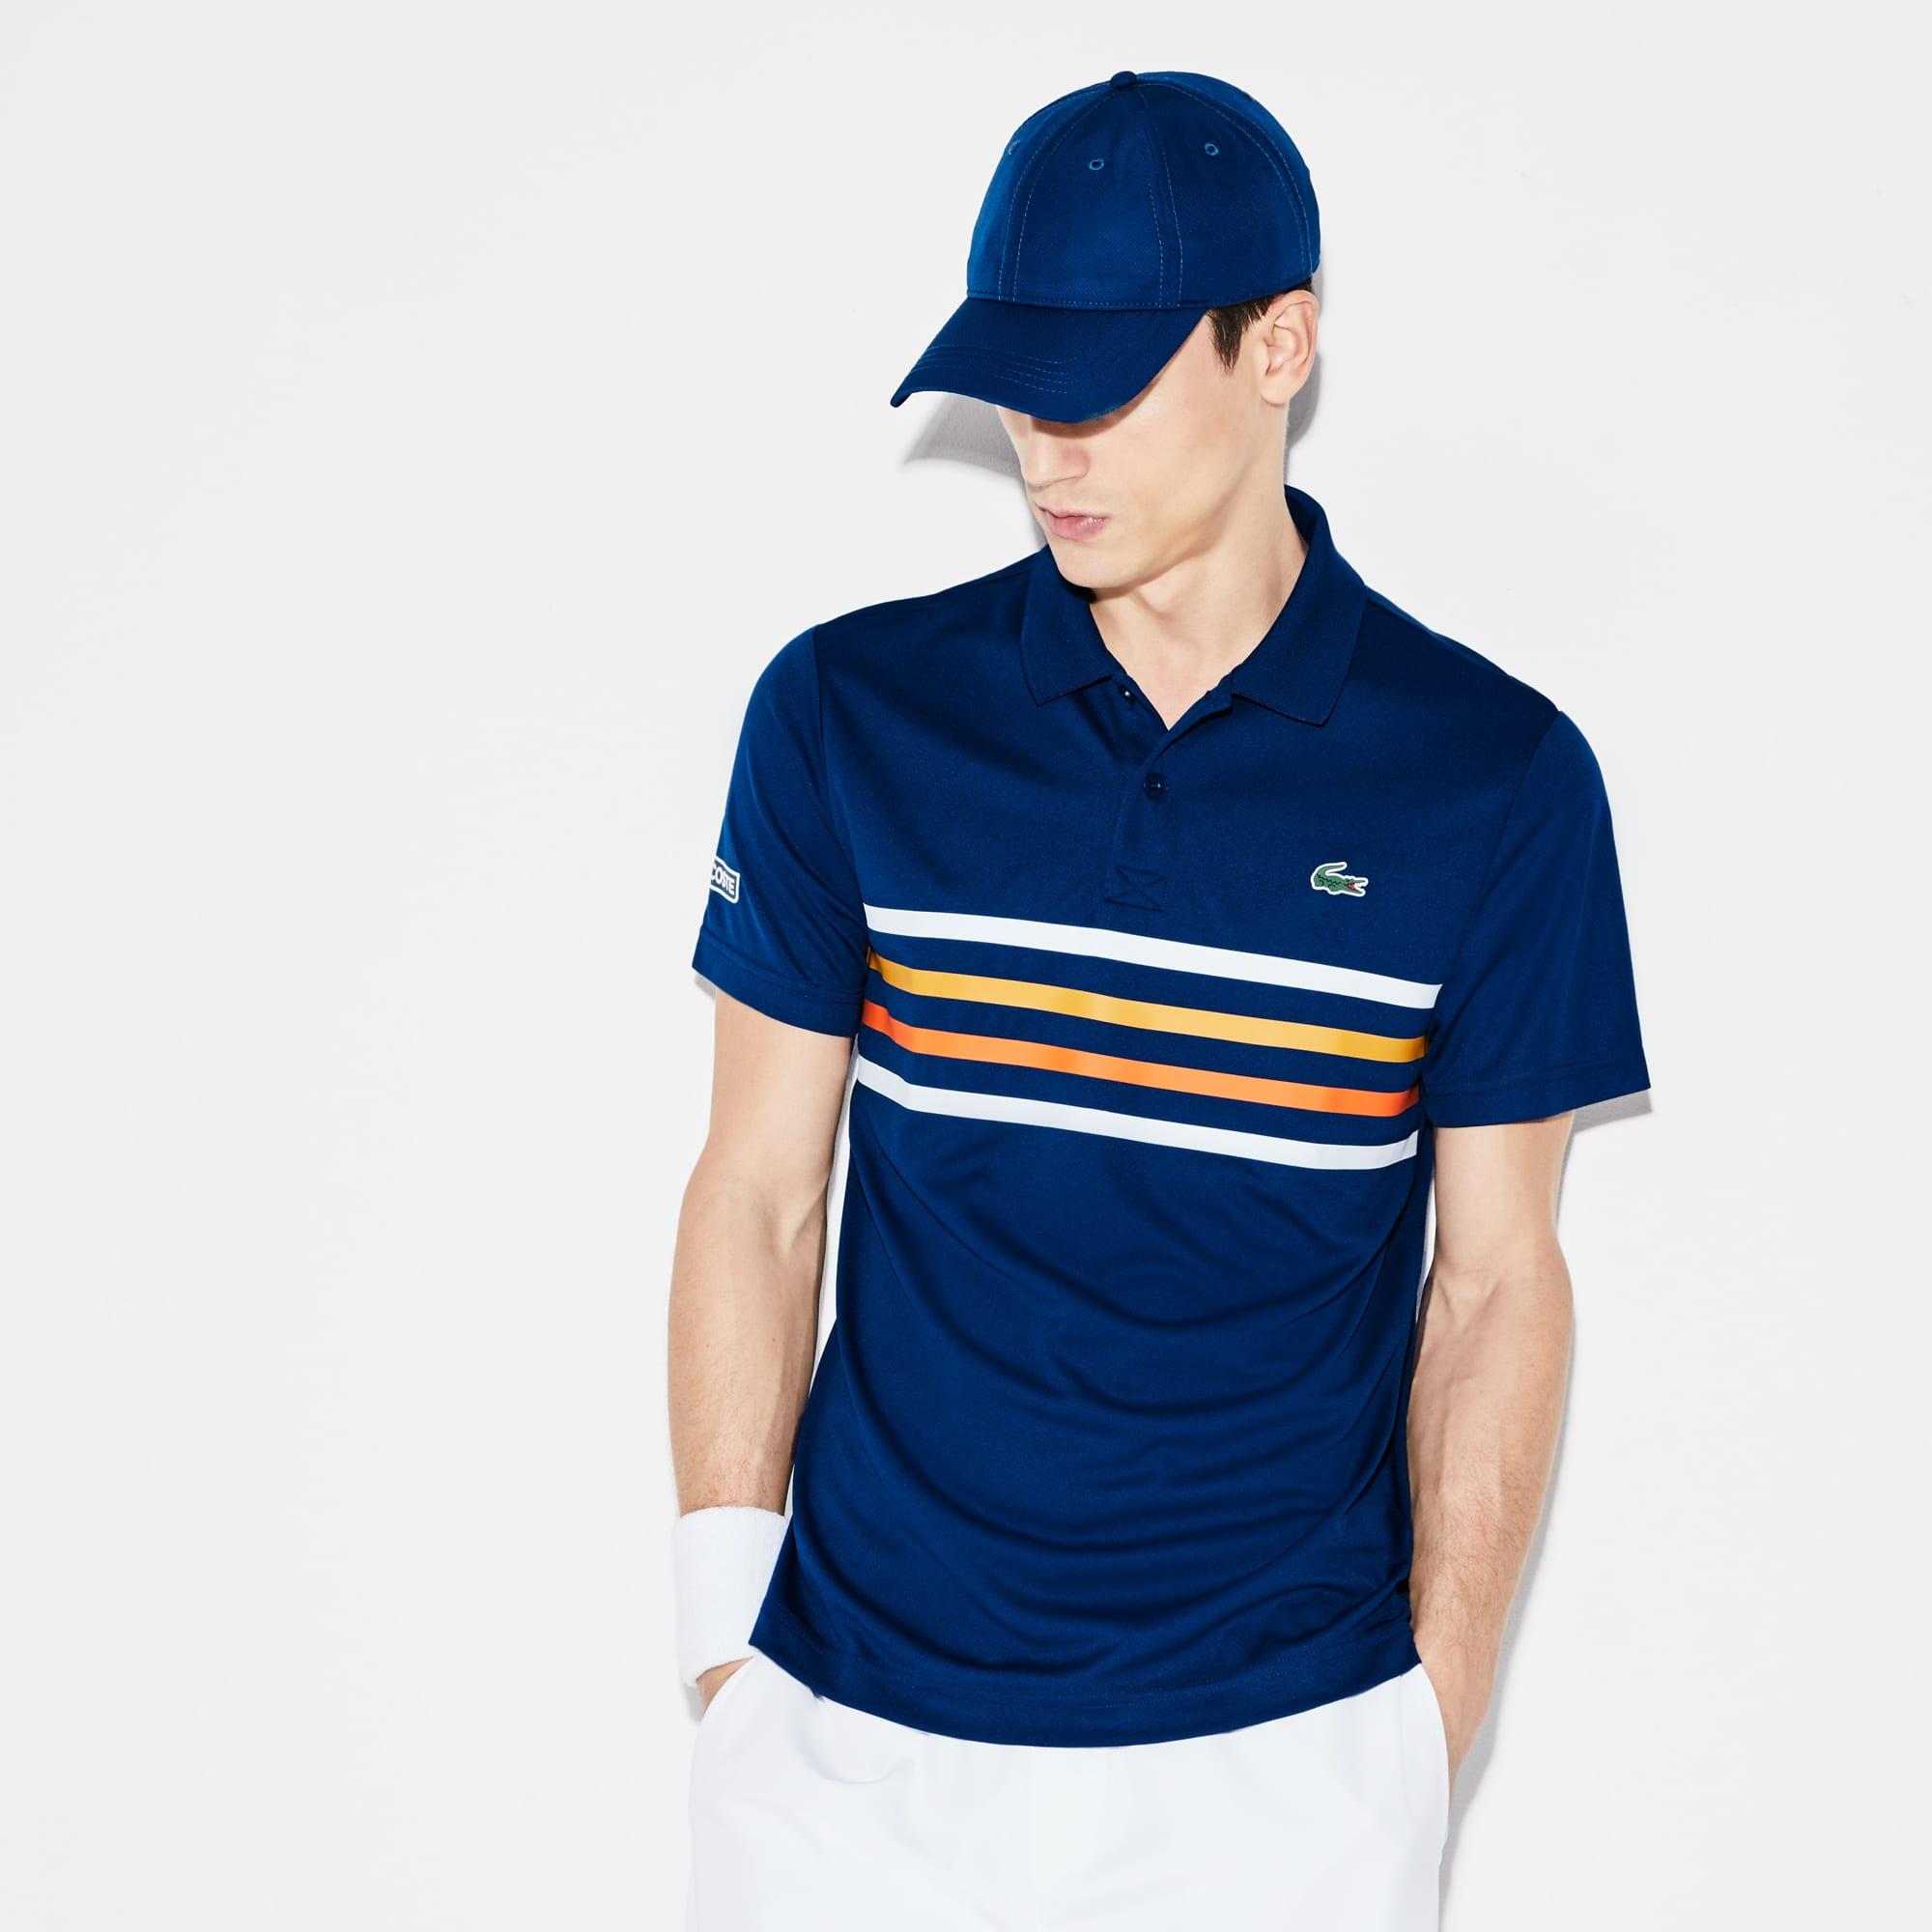 Men's Lacoste SPORT Colored Bands Technical Piqué Tennis Polo